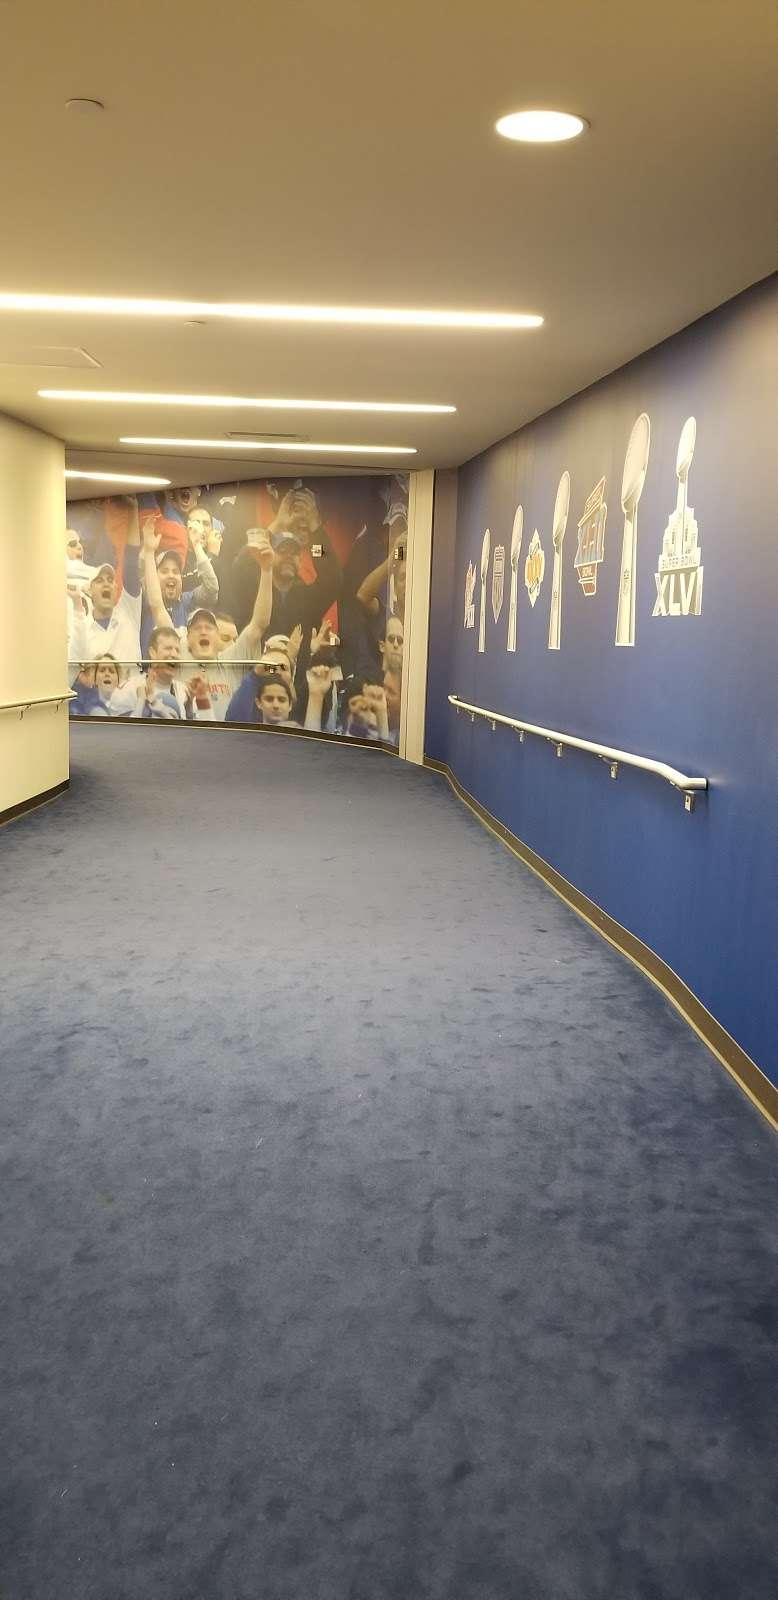 Giants Stadium - stadium  | Photo 6 of 10 | Address: 50 NJ-120, East Rutherford, NJ 07073, USA